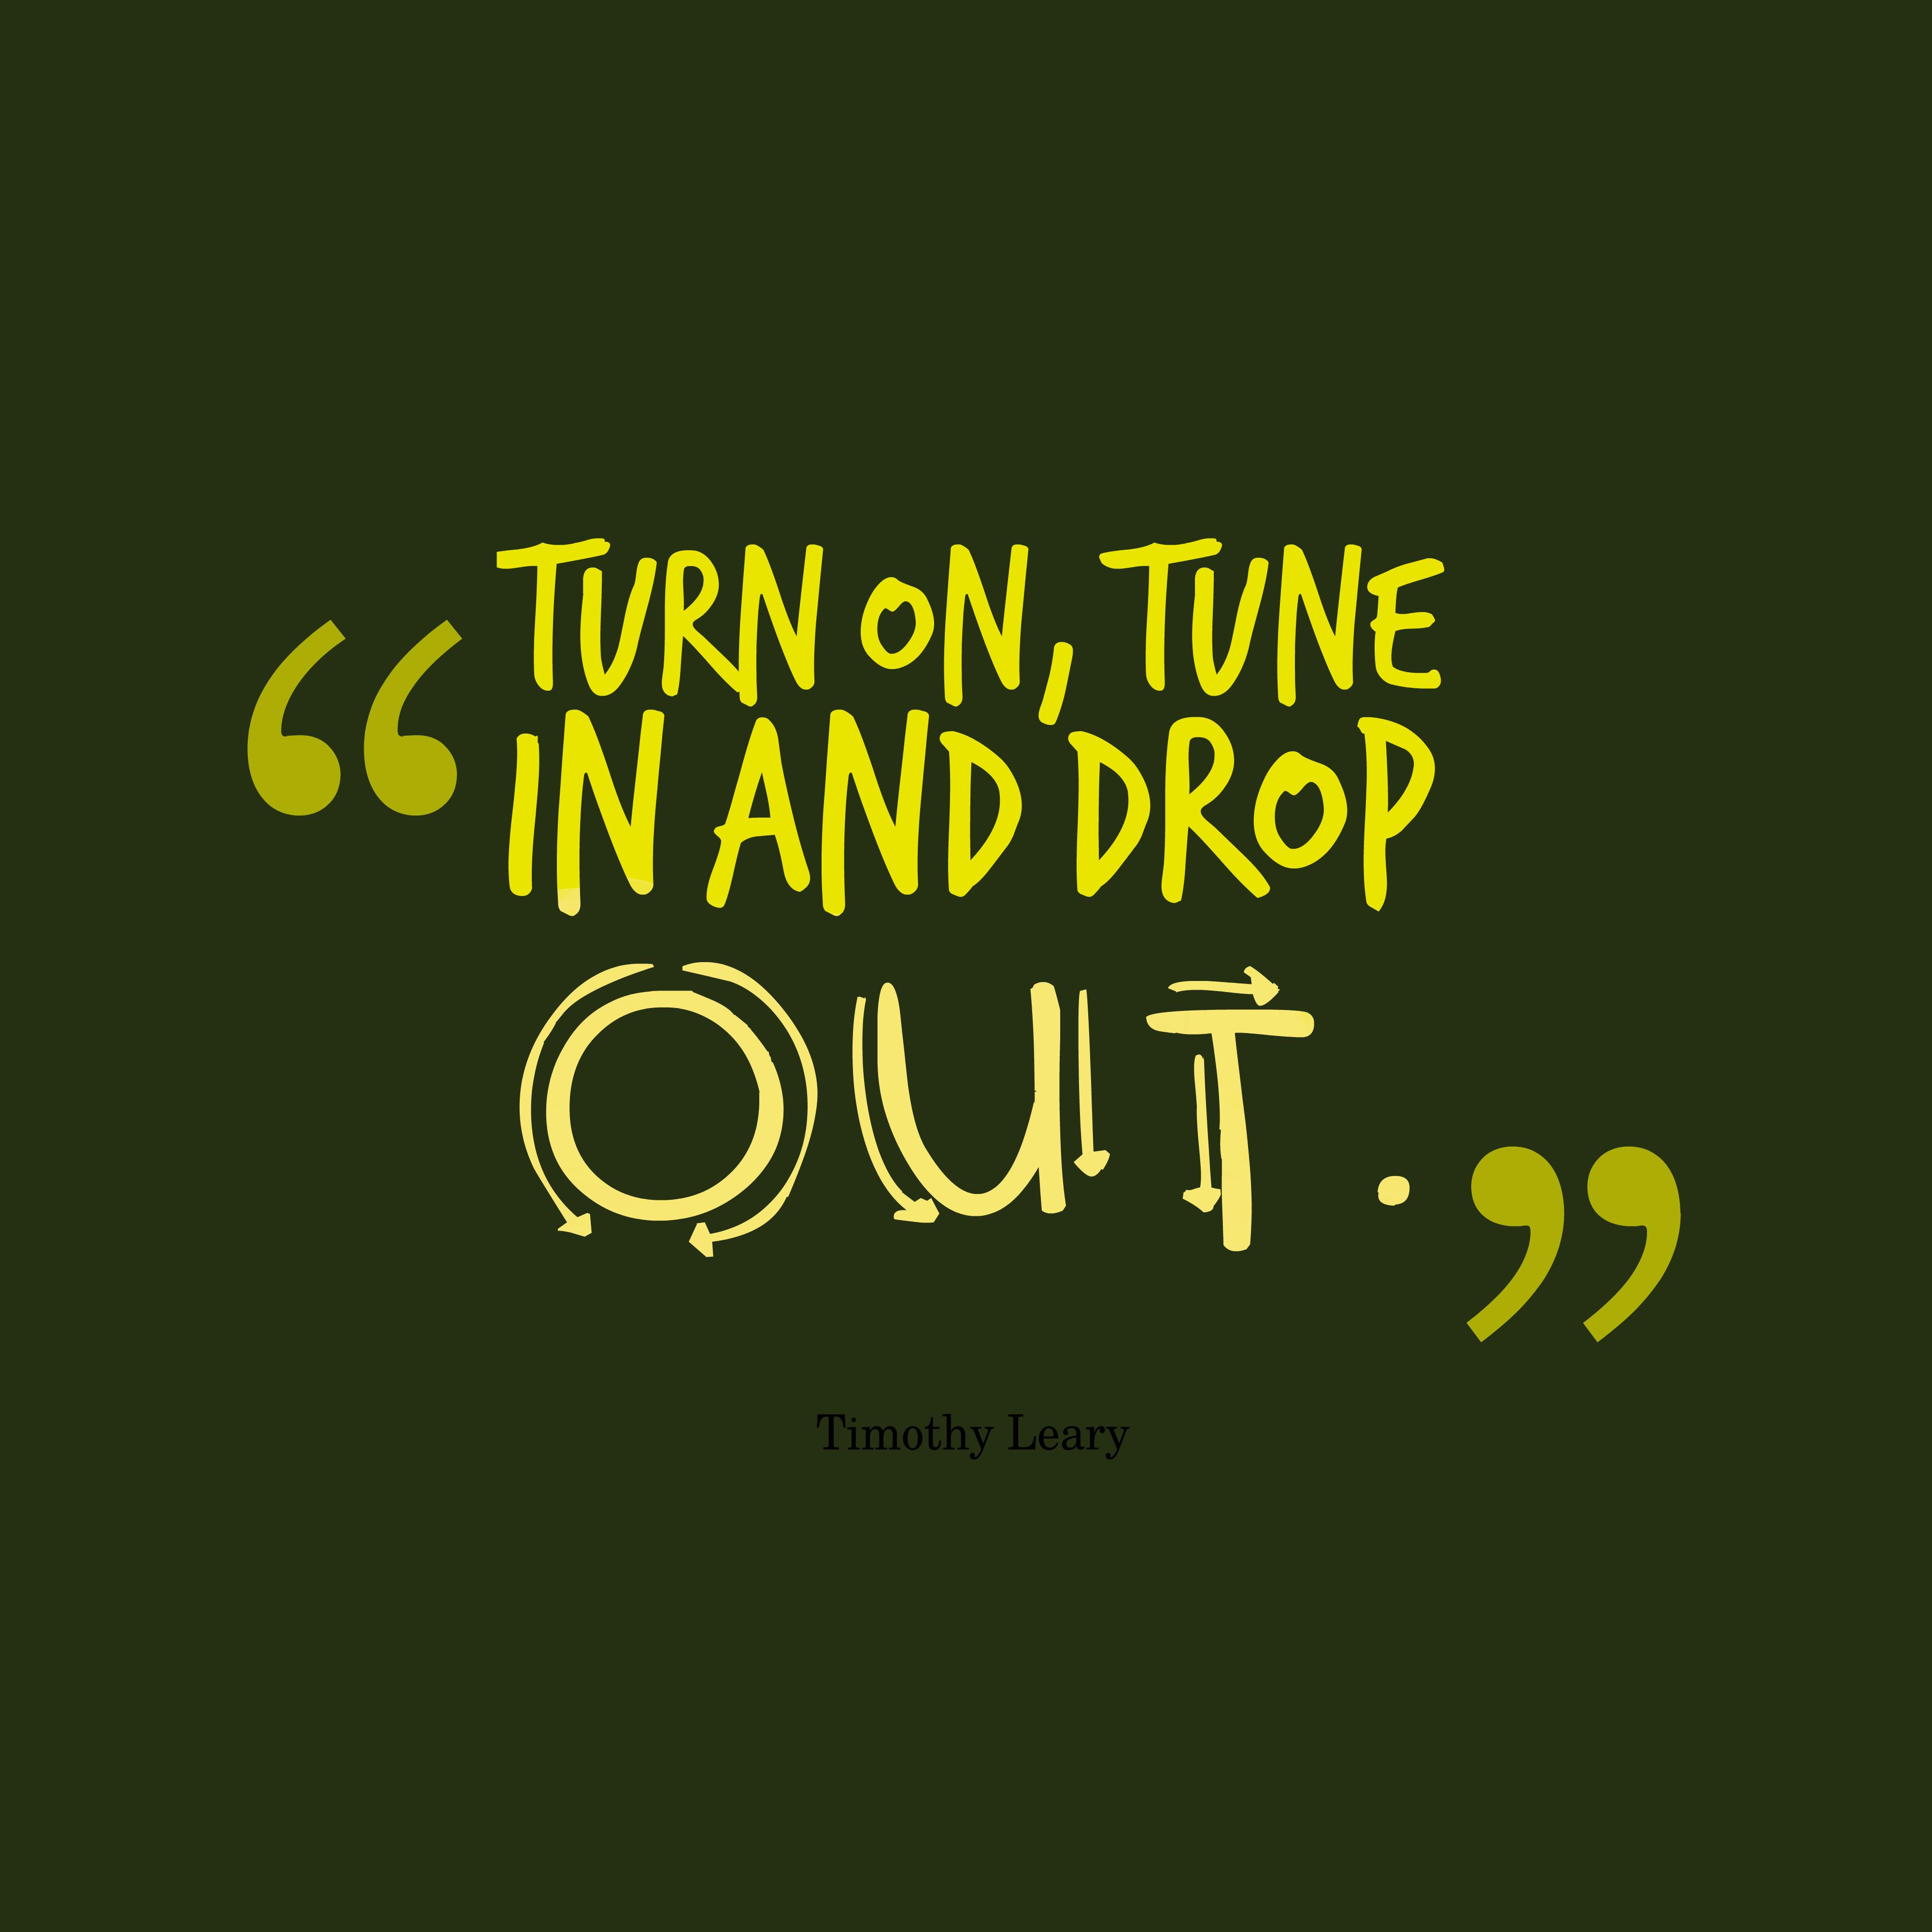 Turn on, tune